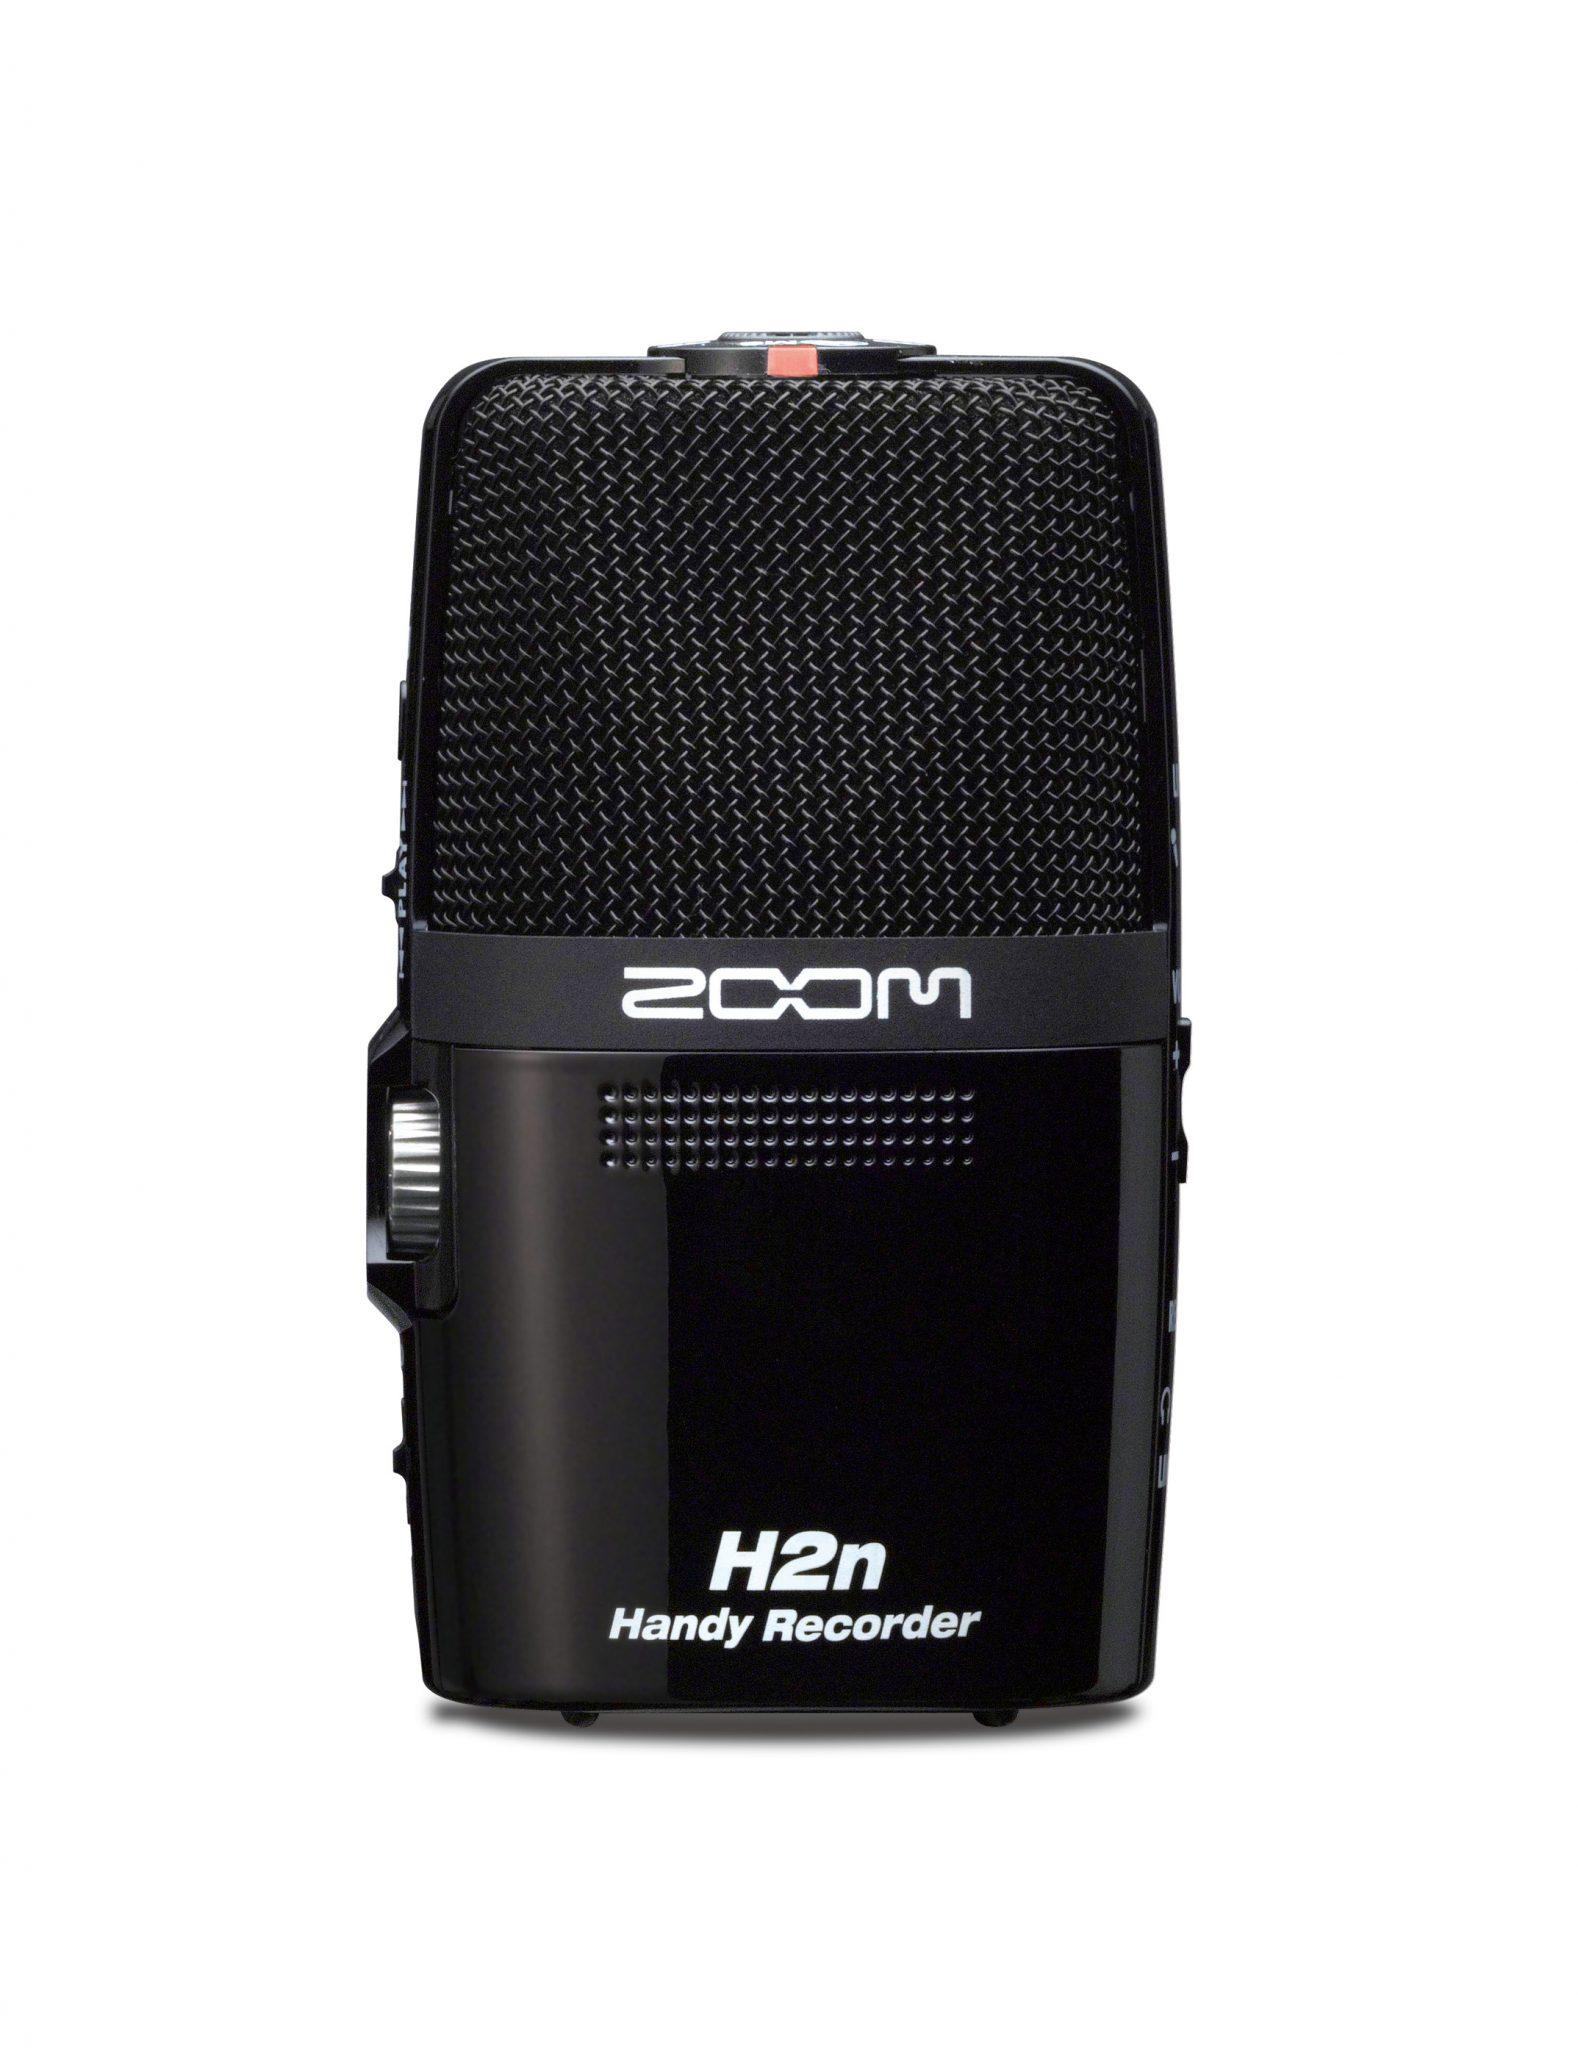 Zoom H2next